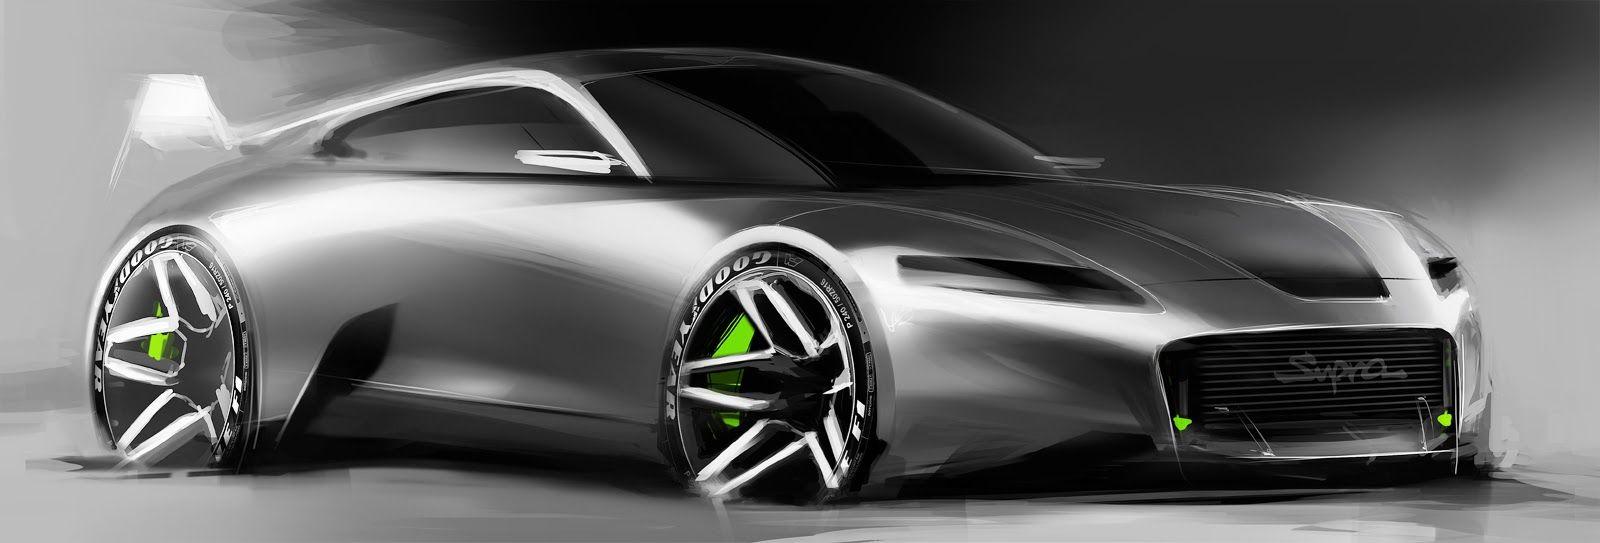 Toyota Supra new generation random sketch